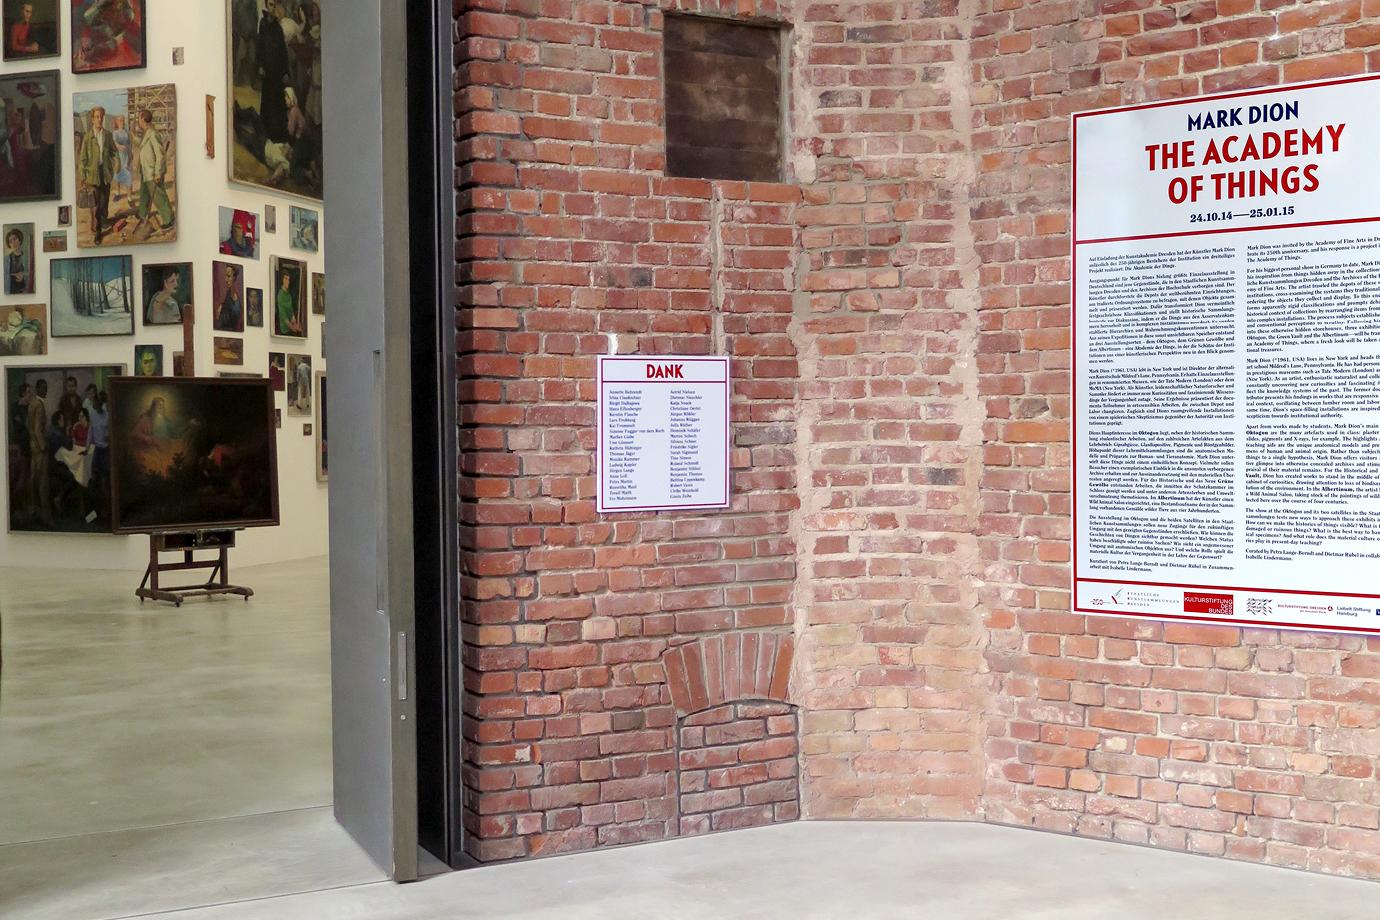 http://e-o-t.de/wordpress/wp-content/uploads/2017/10/2014_MarkDion-Exhibition-01.jpg